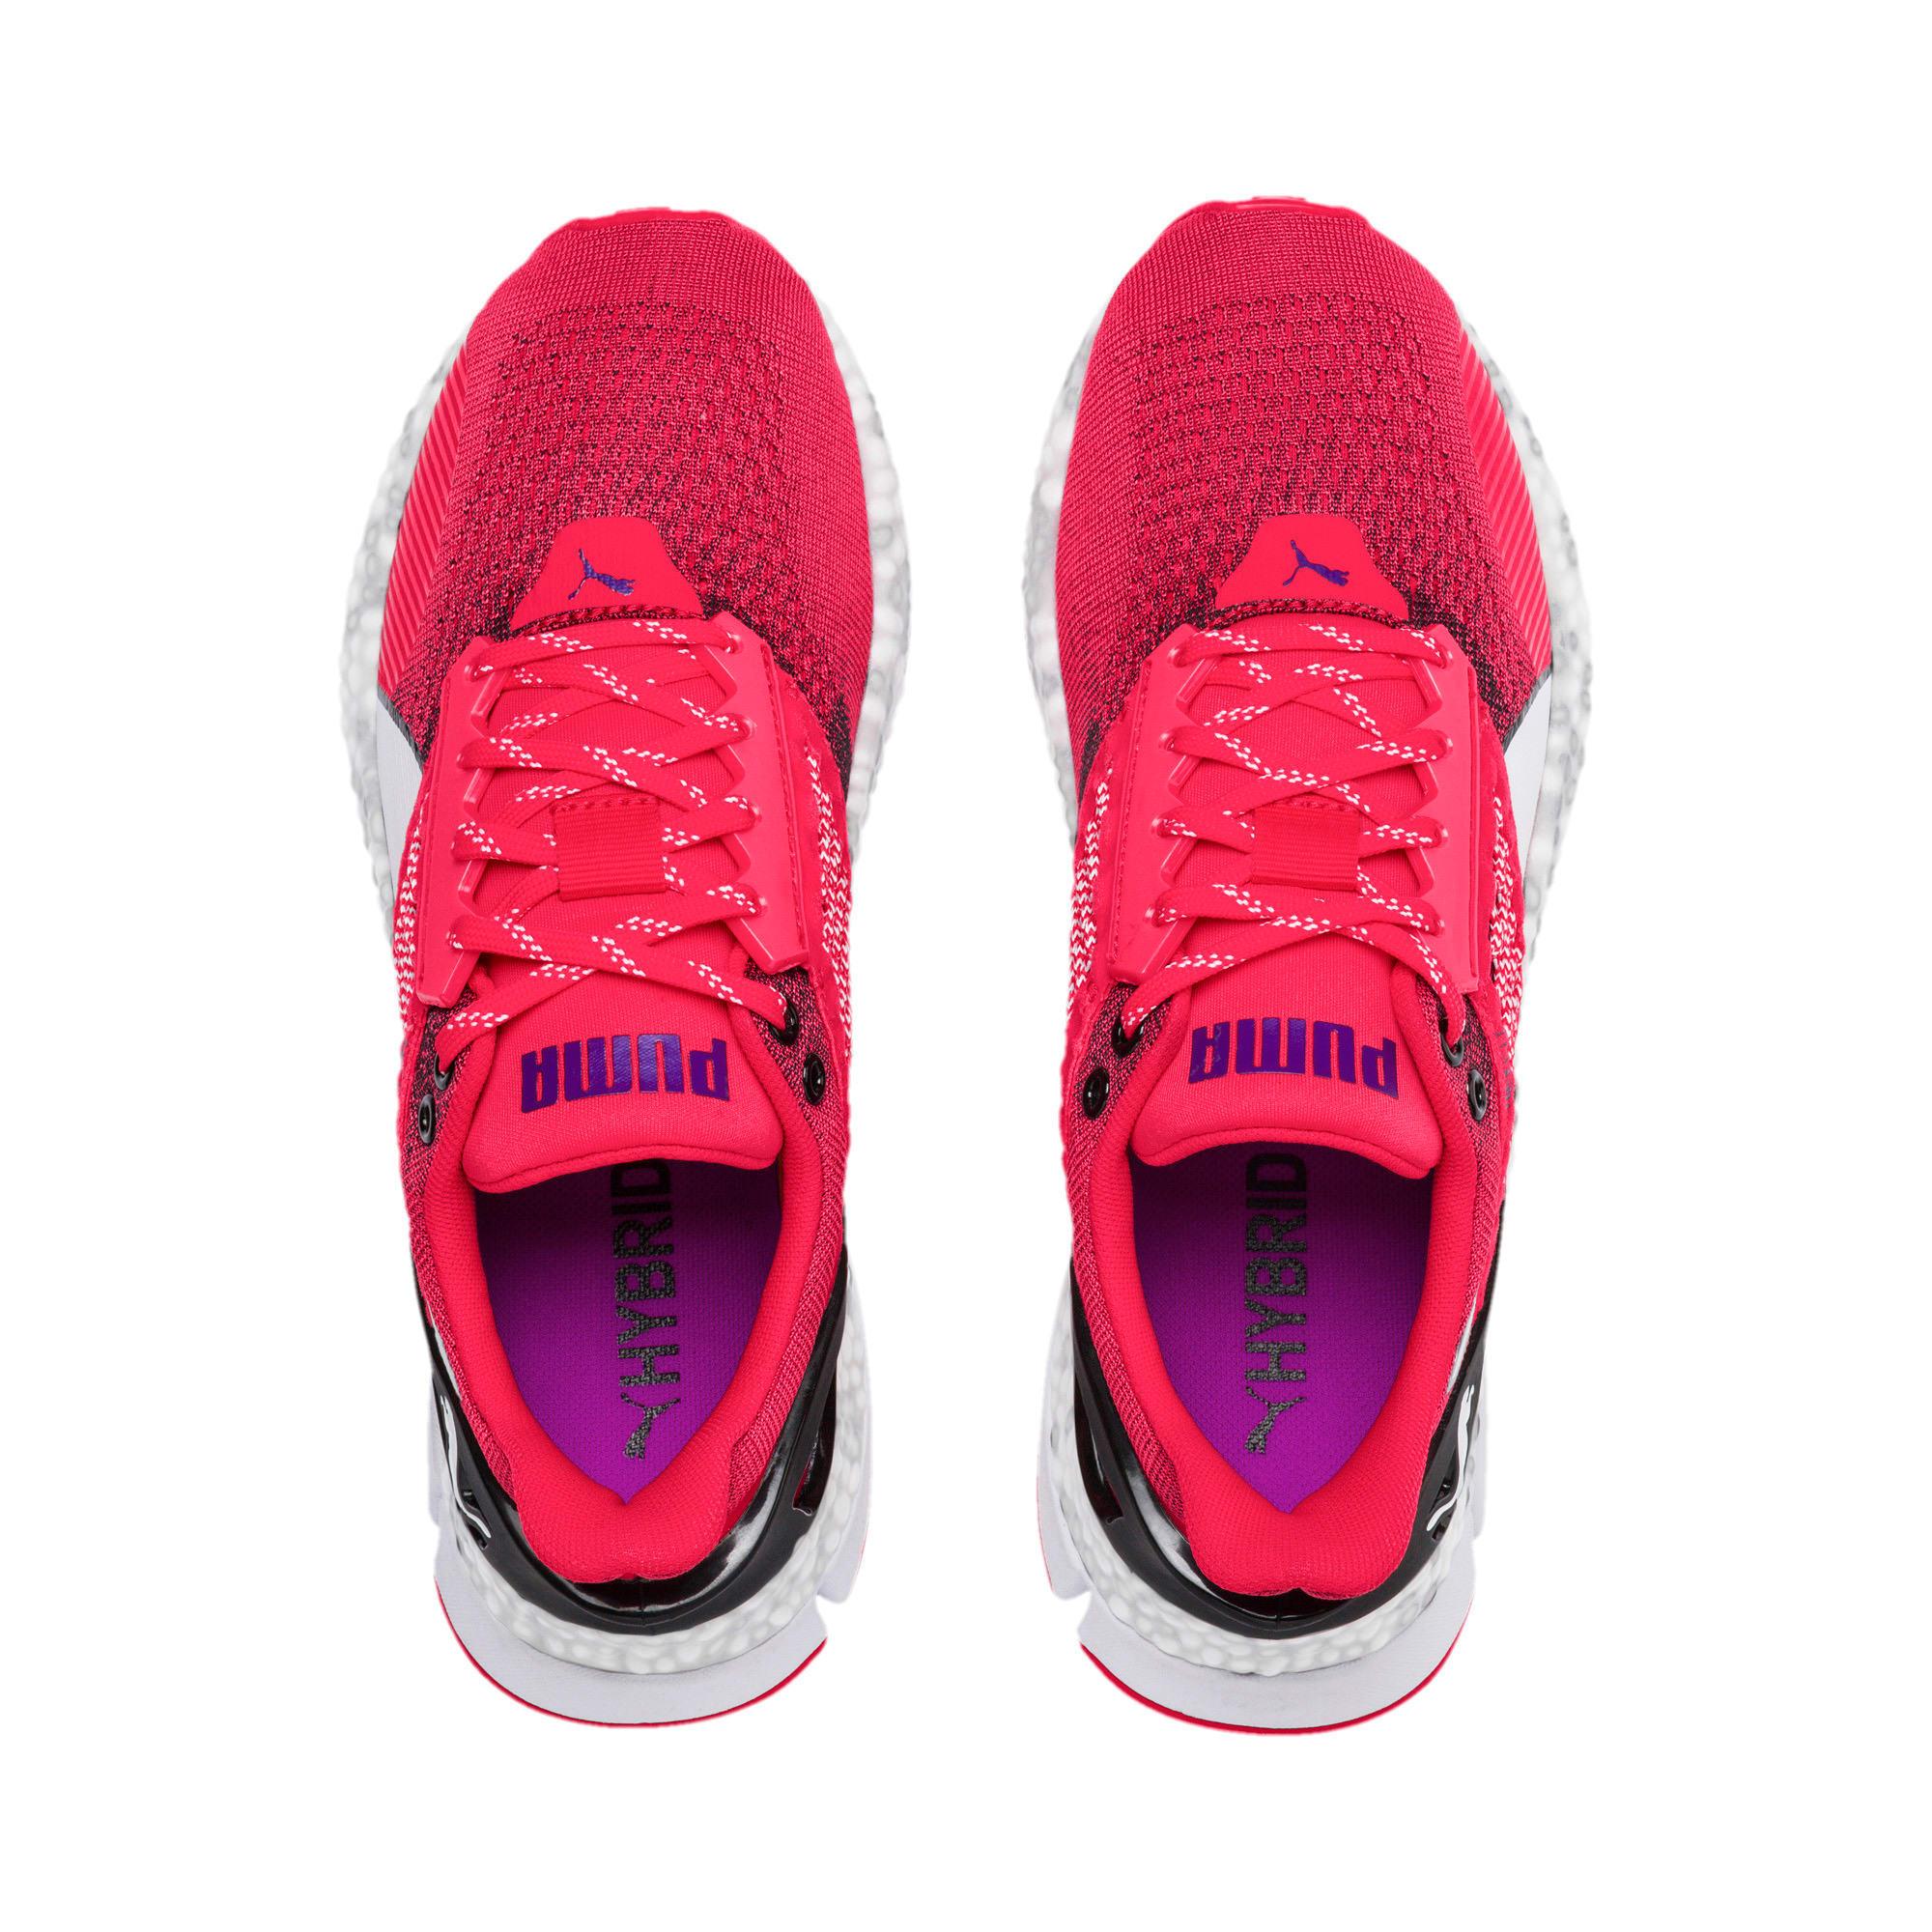 Thumbnail 9 of HYBRID NETFIT Astro Women's Running Shoes, Nrgy Rose-Puma Black, medium